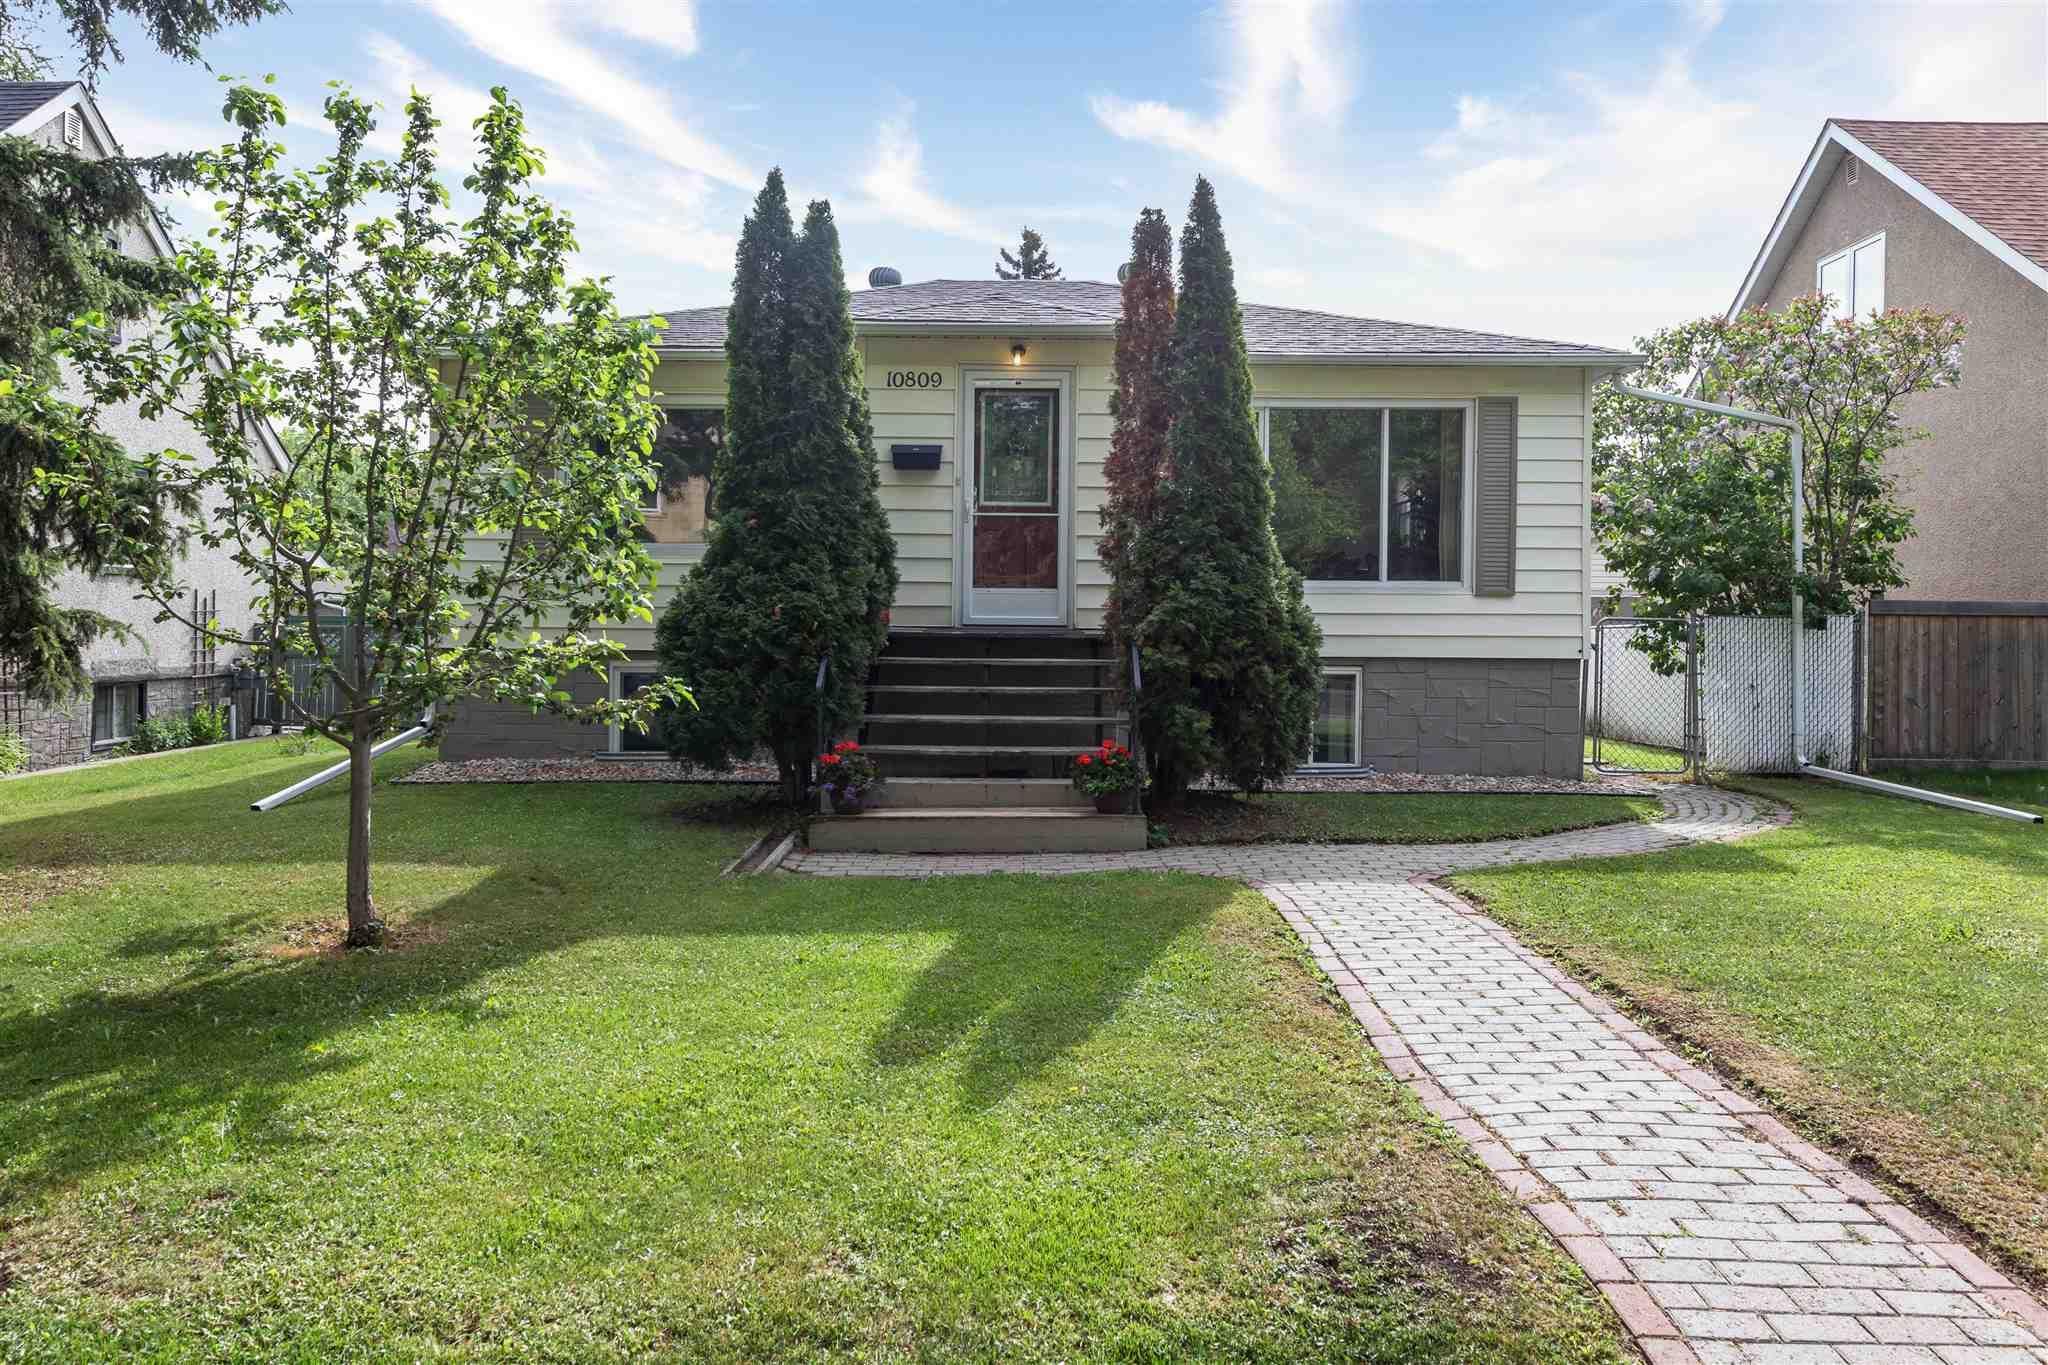 Main Photo: 10809 139 Street in Edmonton: Zone 07 House for sale : MLS®# E4249331